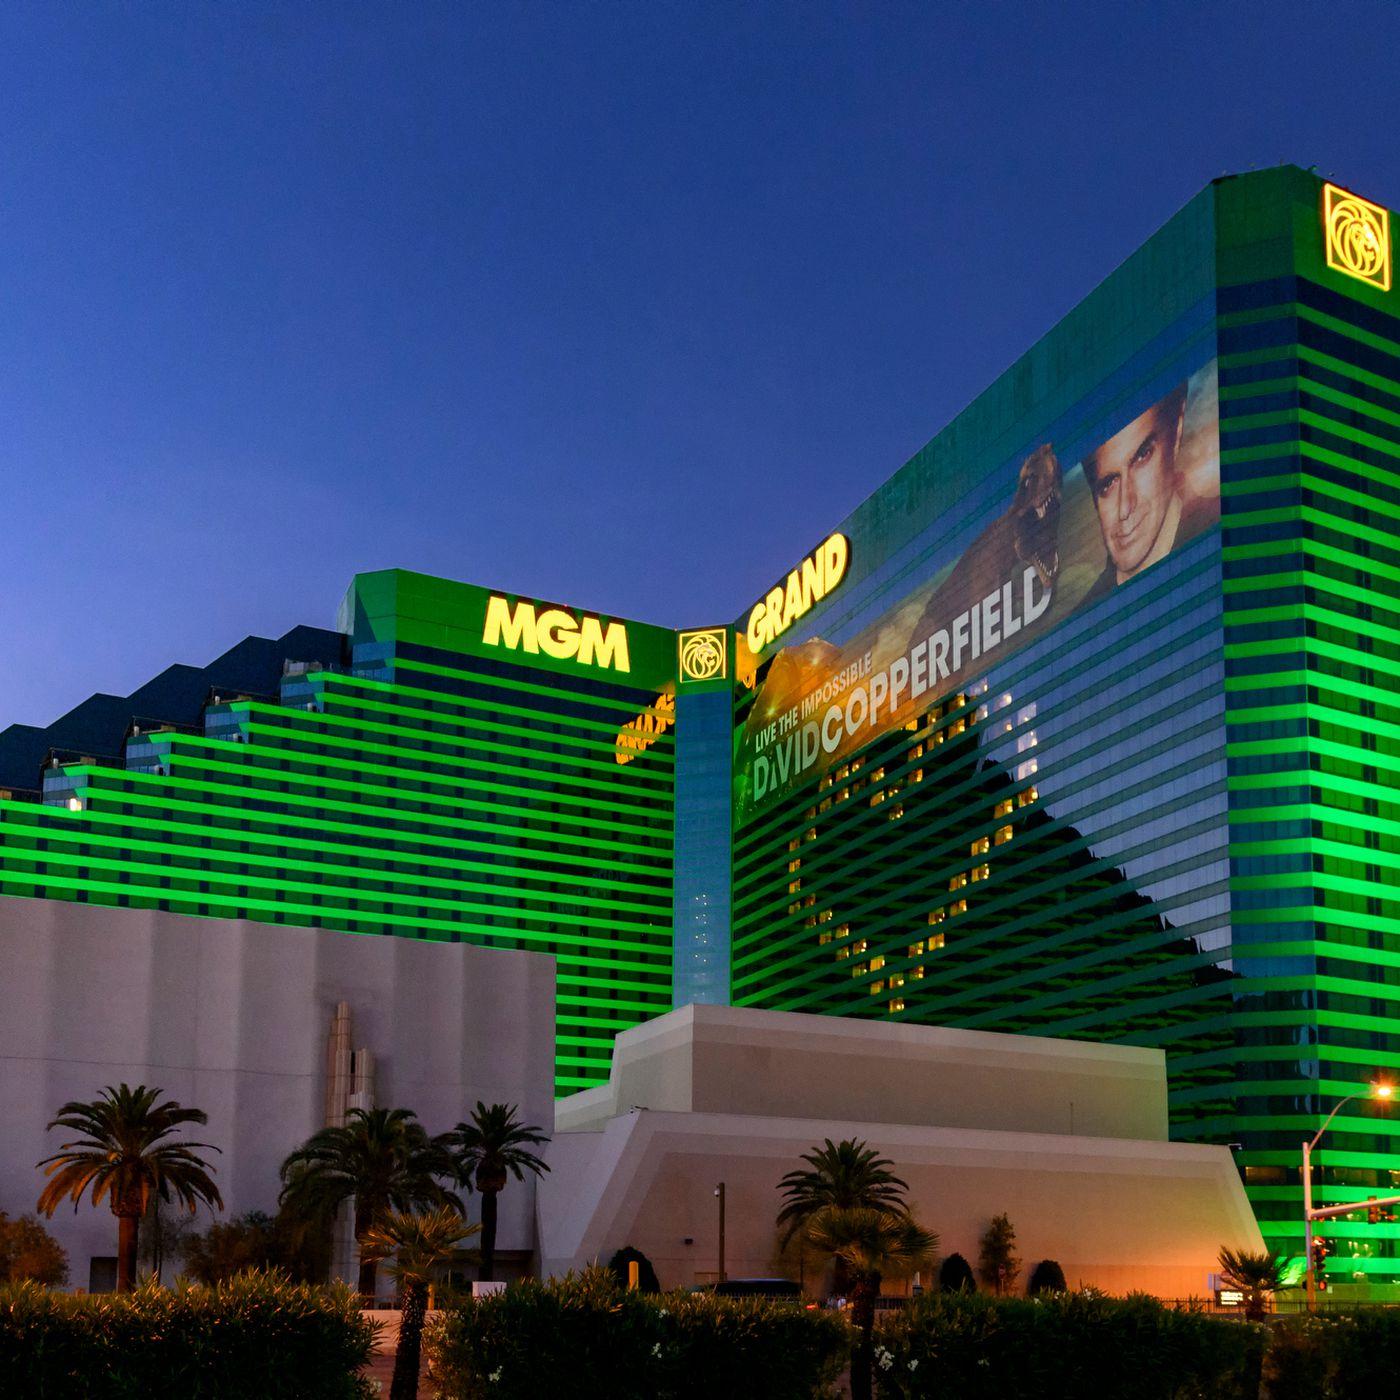 mgm casino in las vegas website